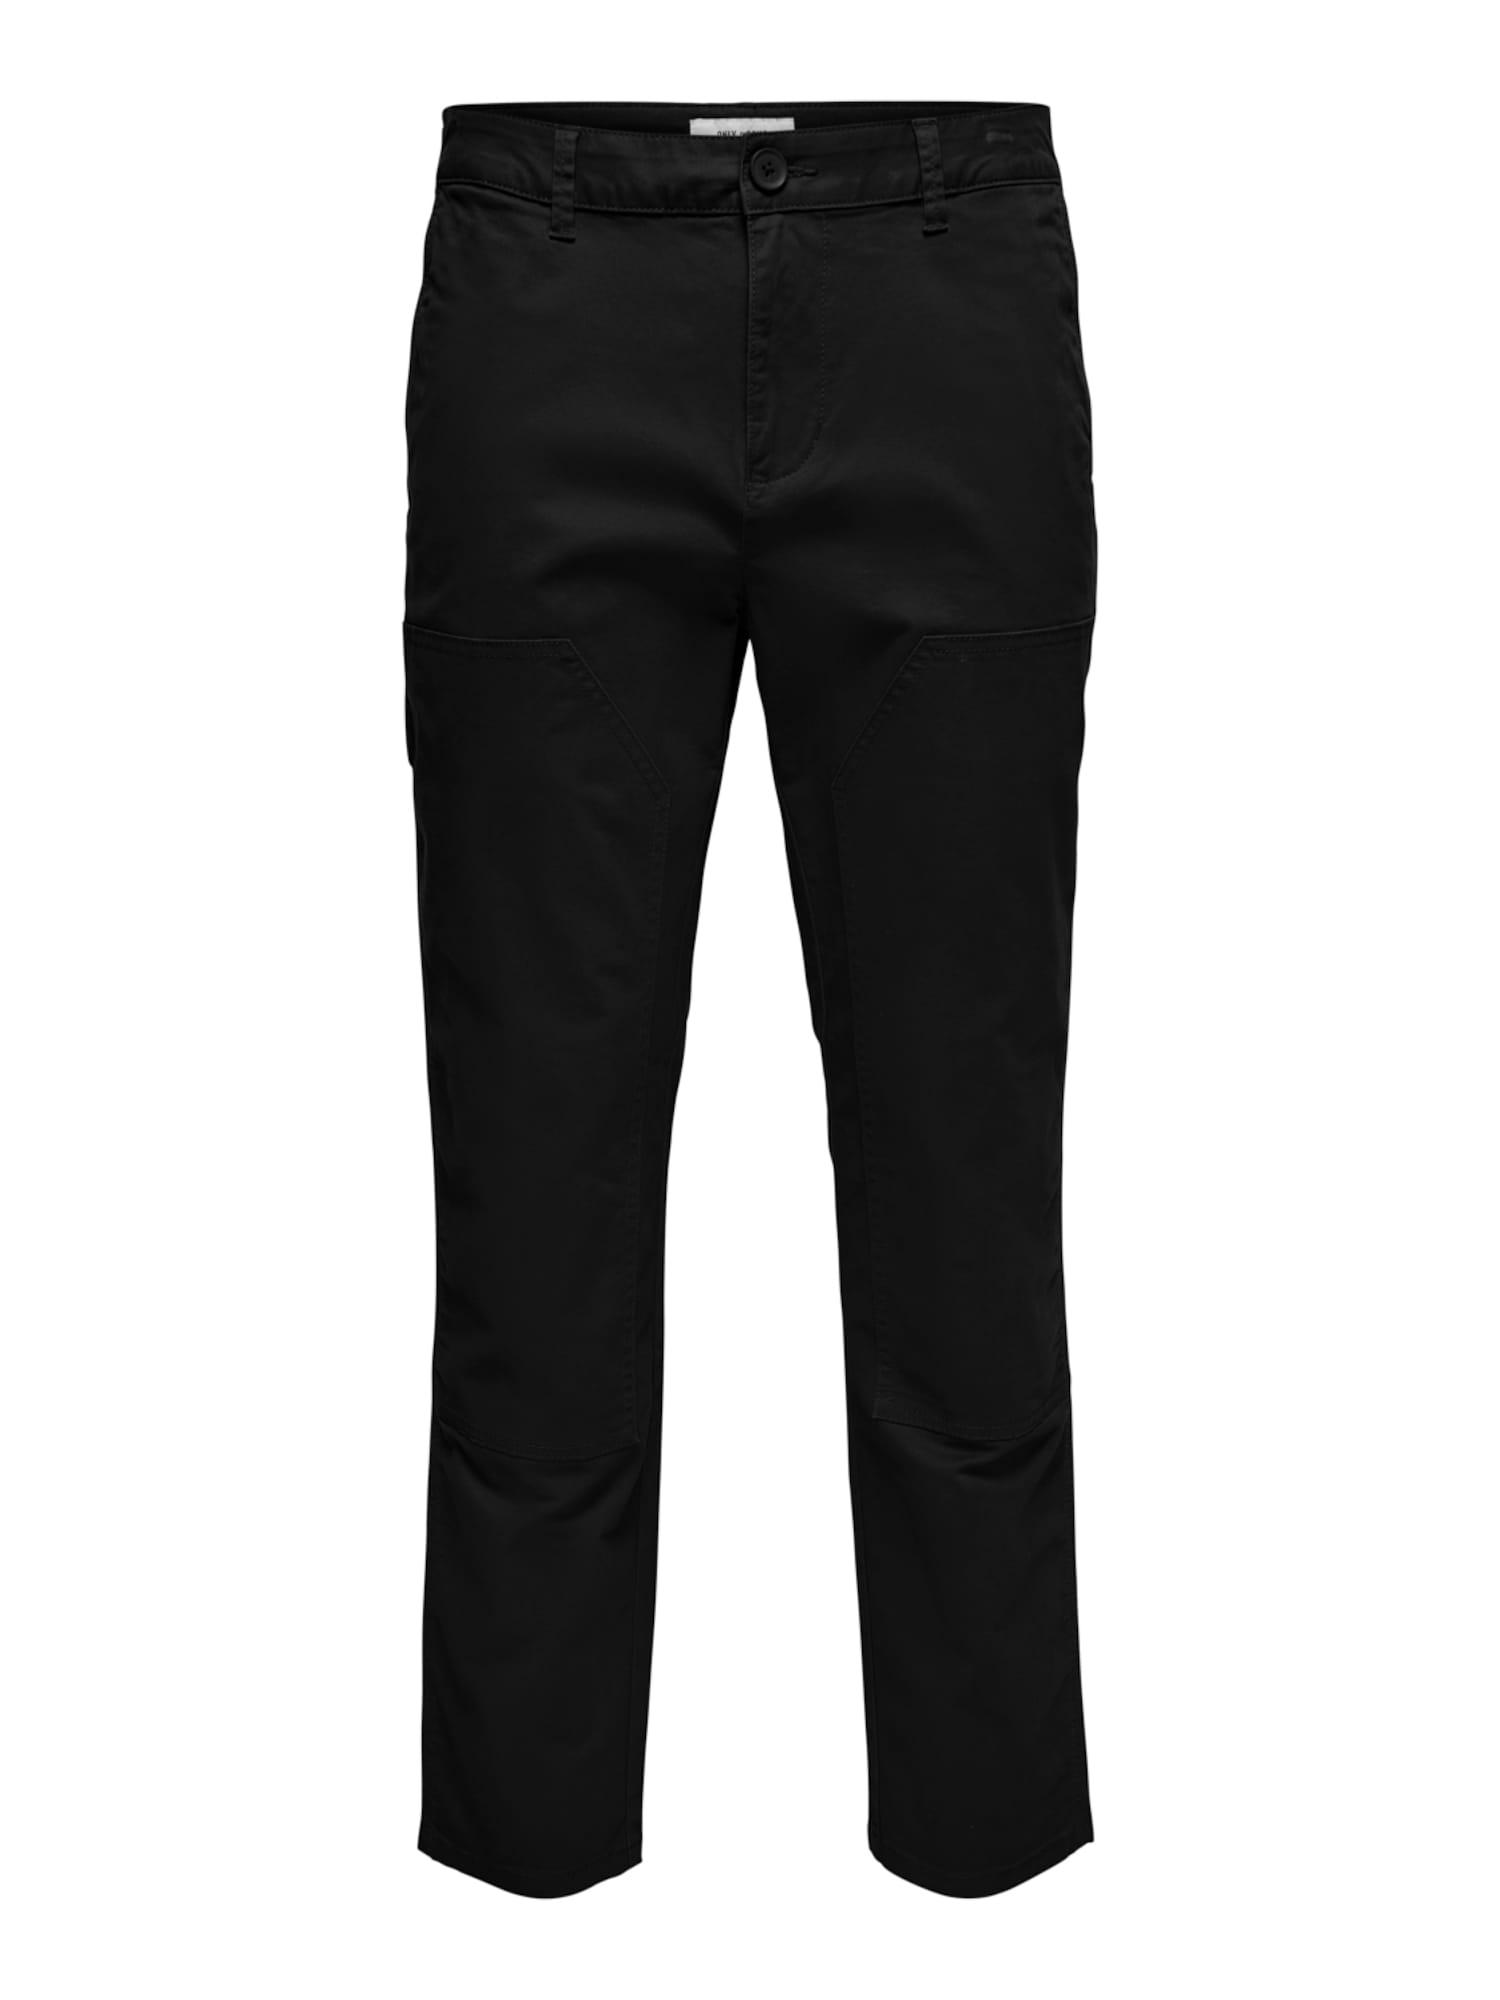 Only & Sons Pantalon 'Cam'  - Noir - Taille: 31 - male